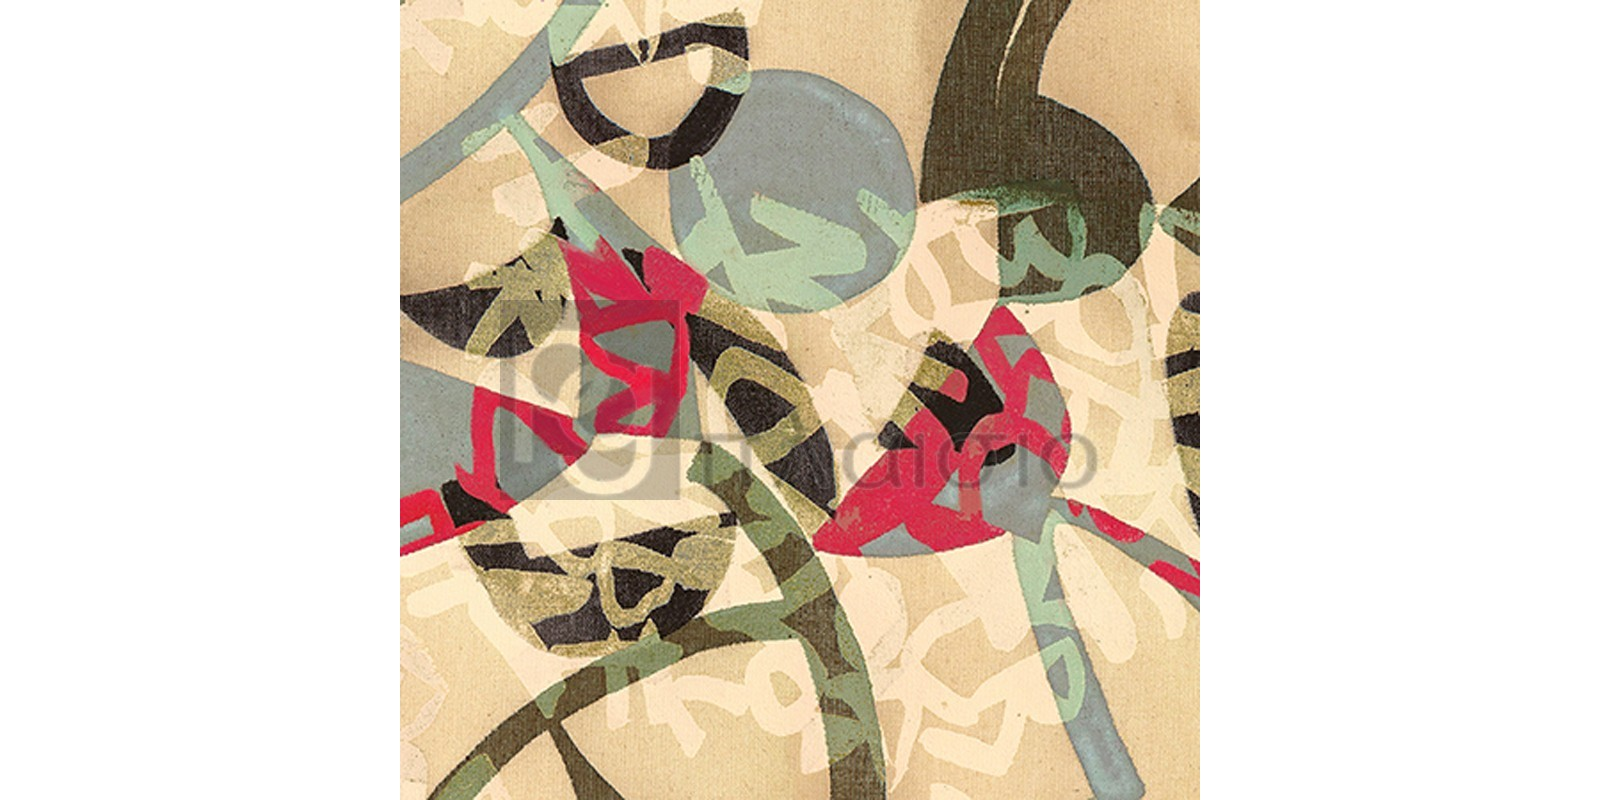 Hype Hopper - Manticore II (detail I)